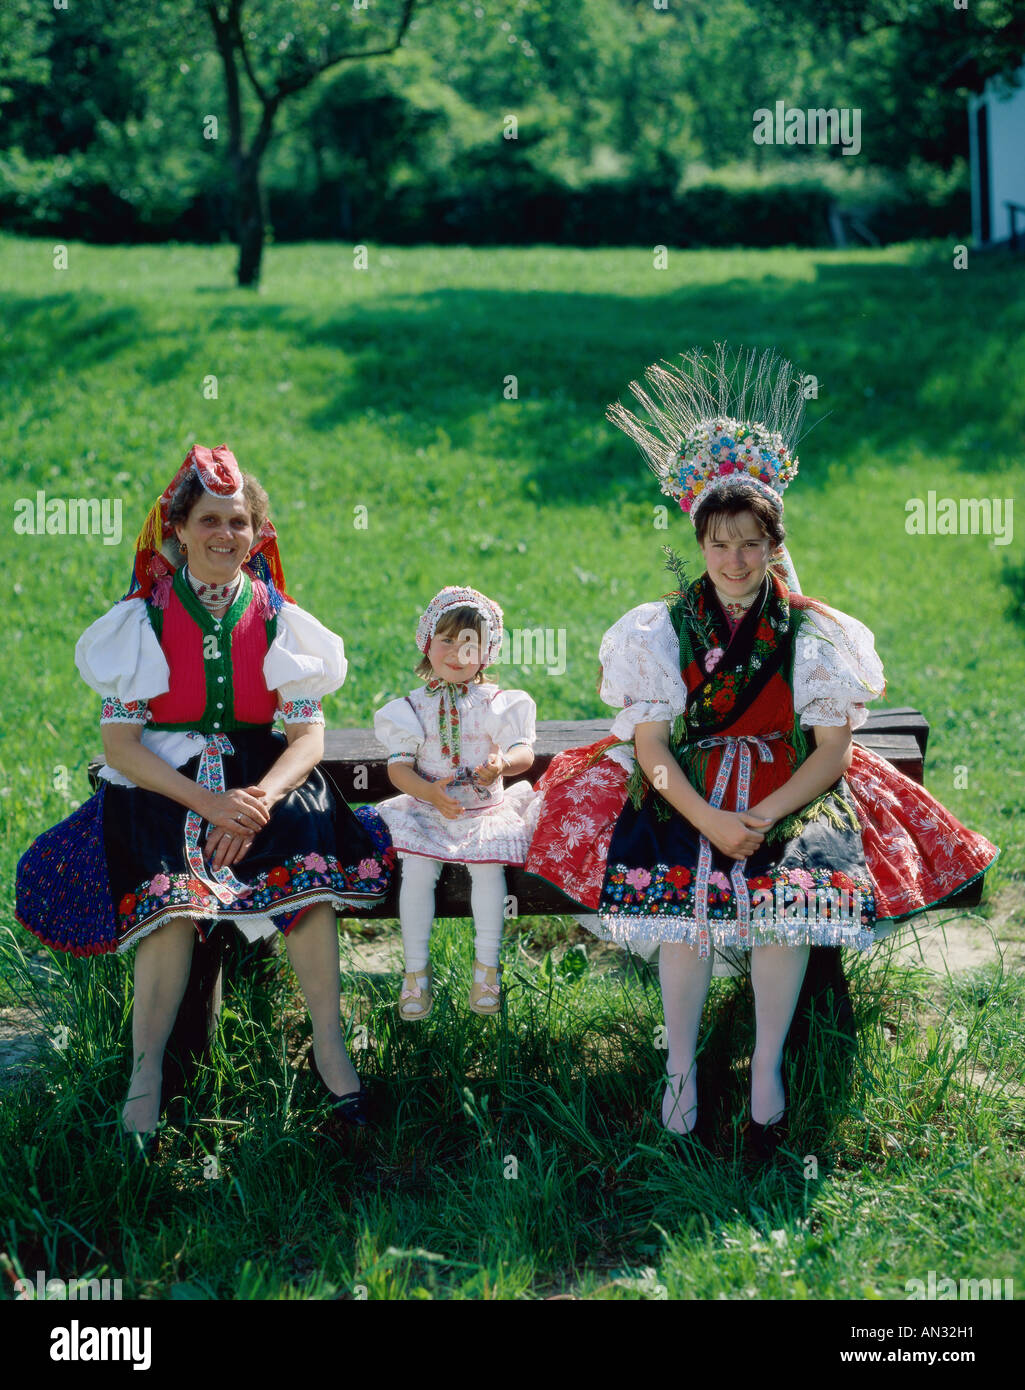 Traditionelle Folklore Kostüm, Ungarn Stockbild